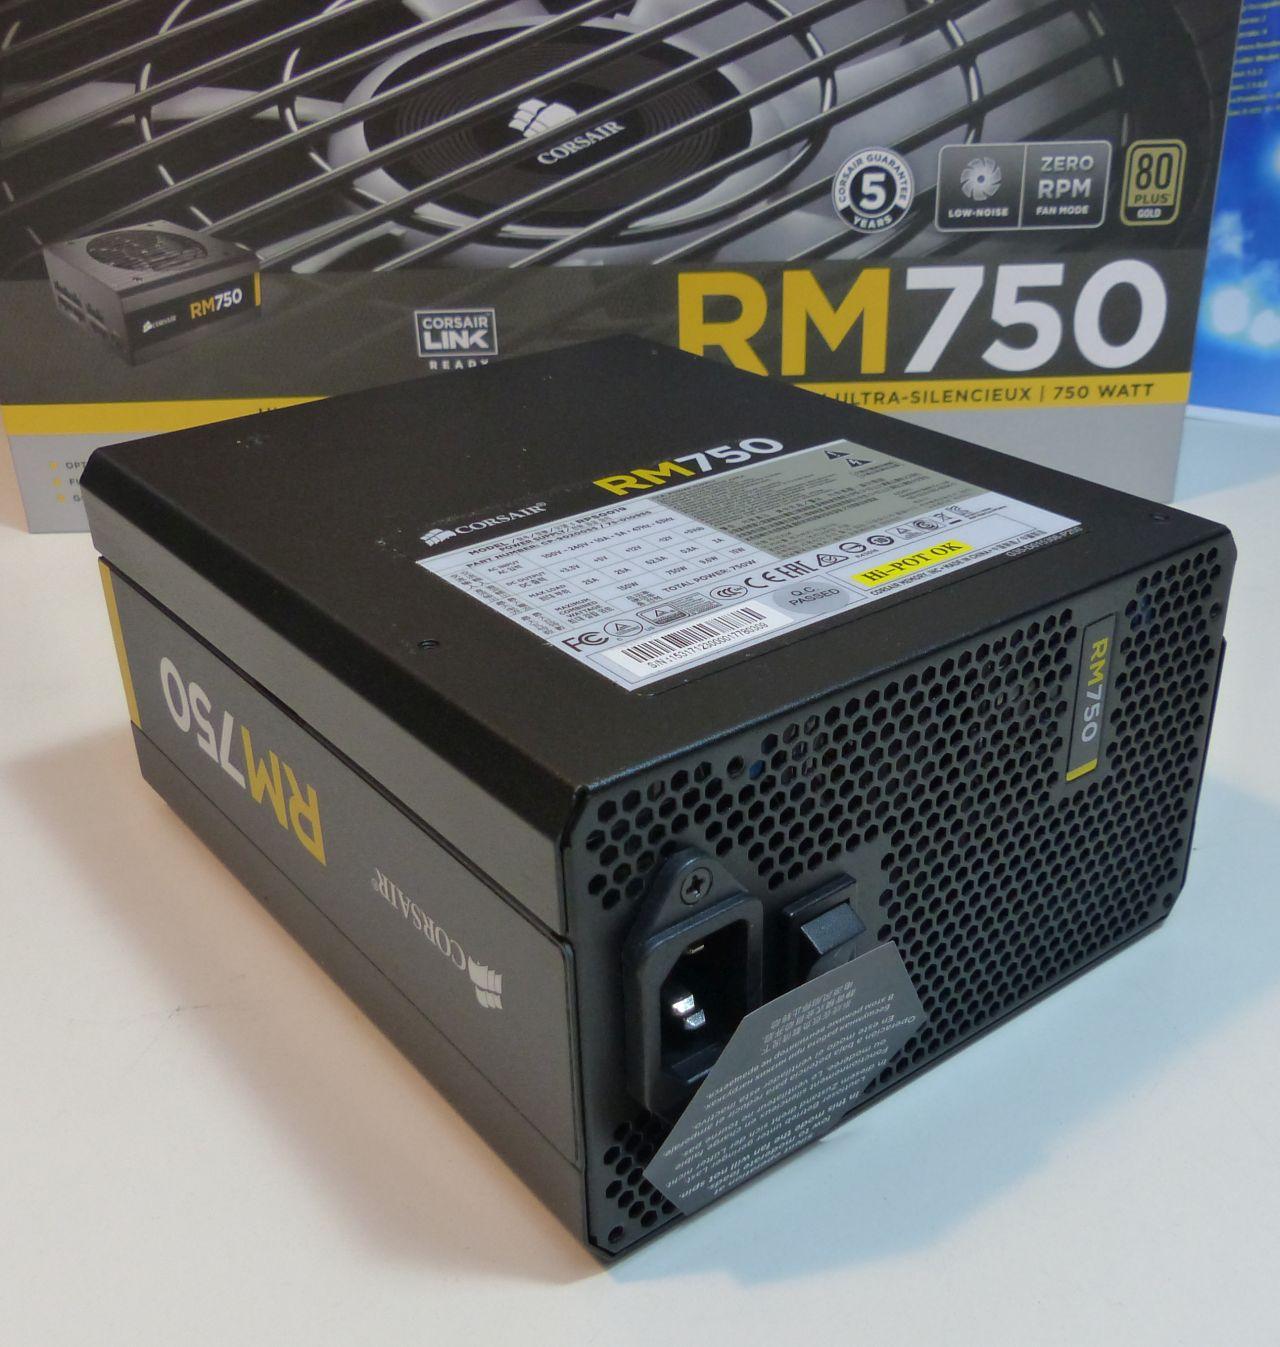 Corsair RM750 Ultra Quiet Power Supply Unit